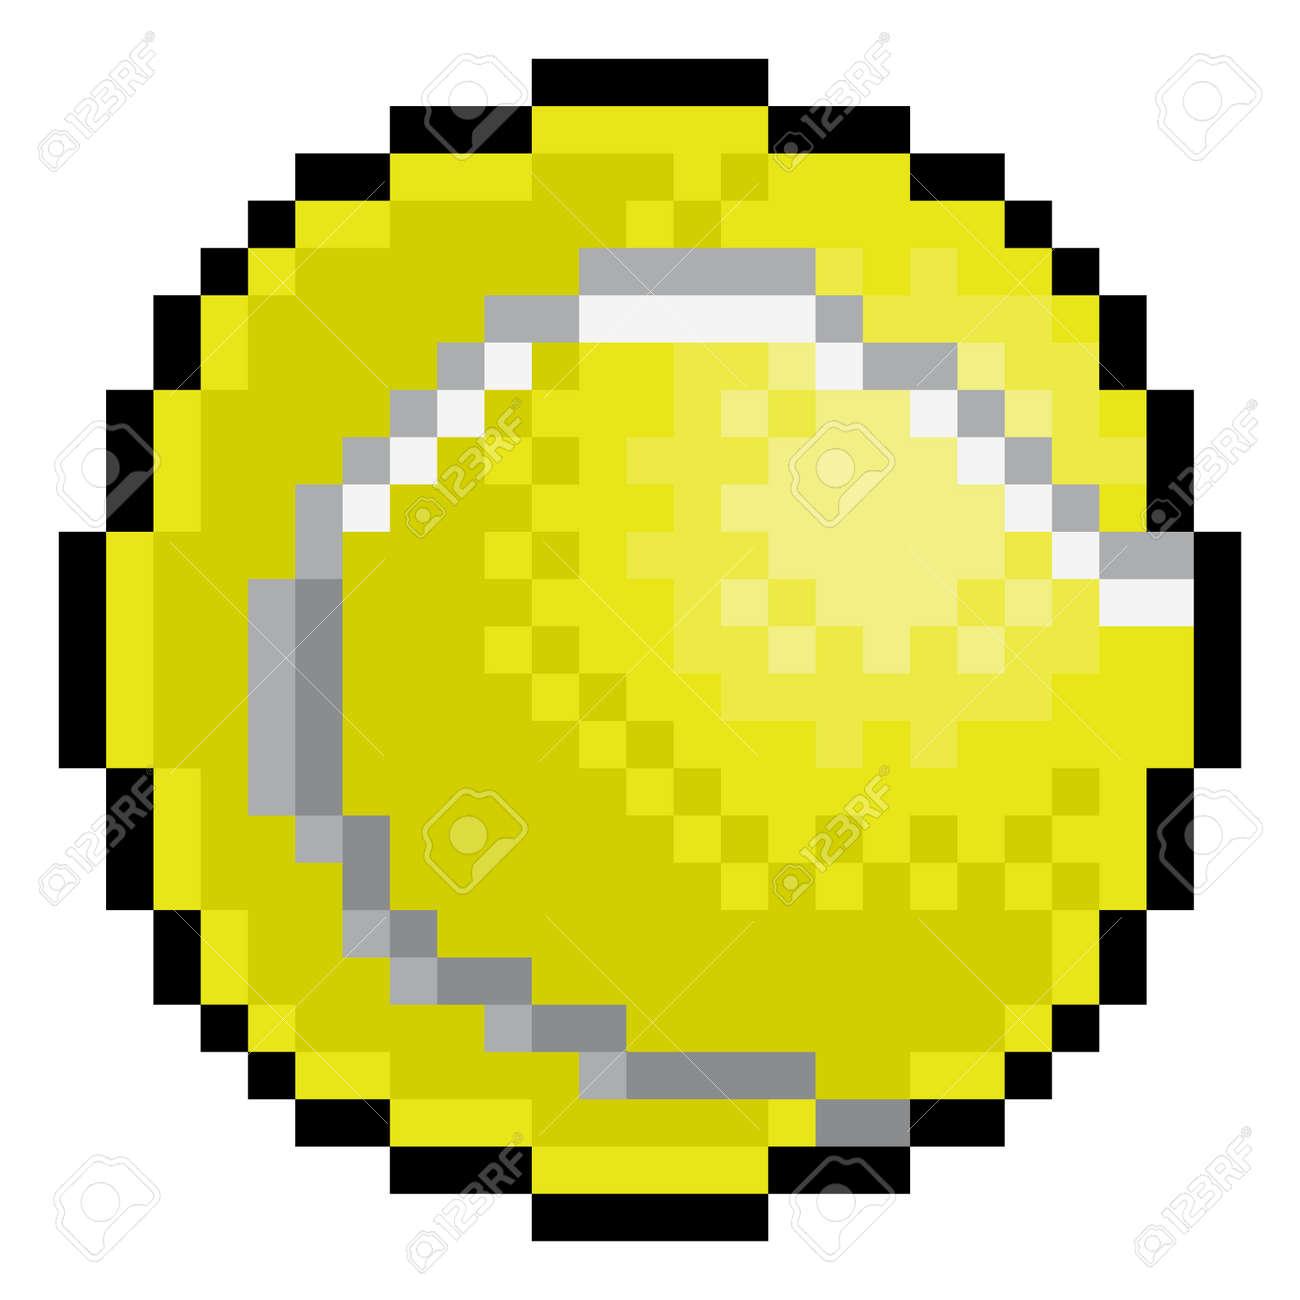 Tennis Ball Pixel Art Eight Bit Sports Game Icon - 155227444